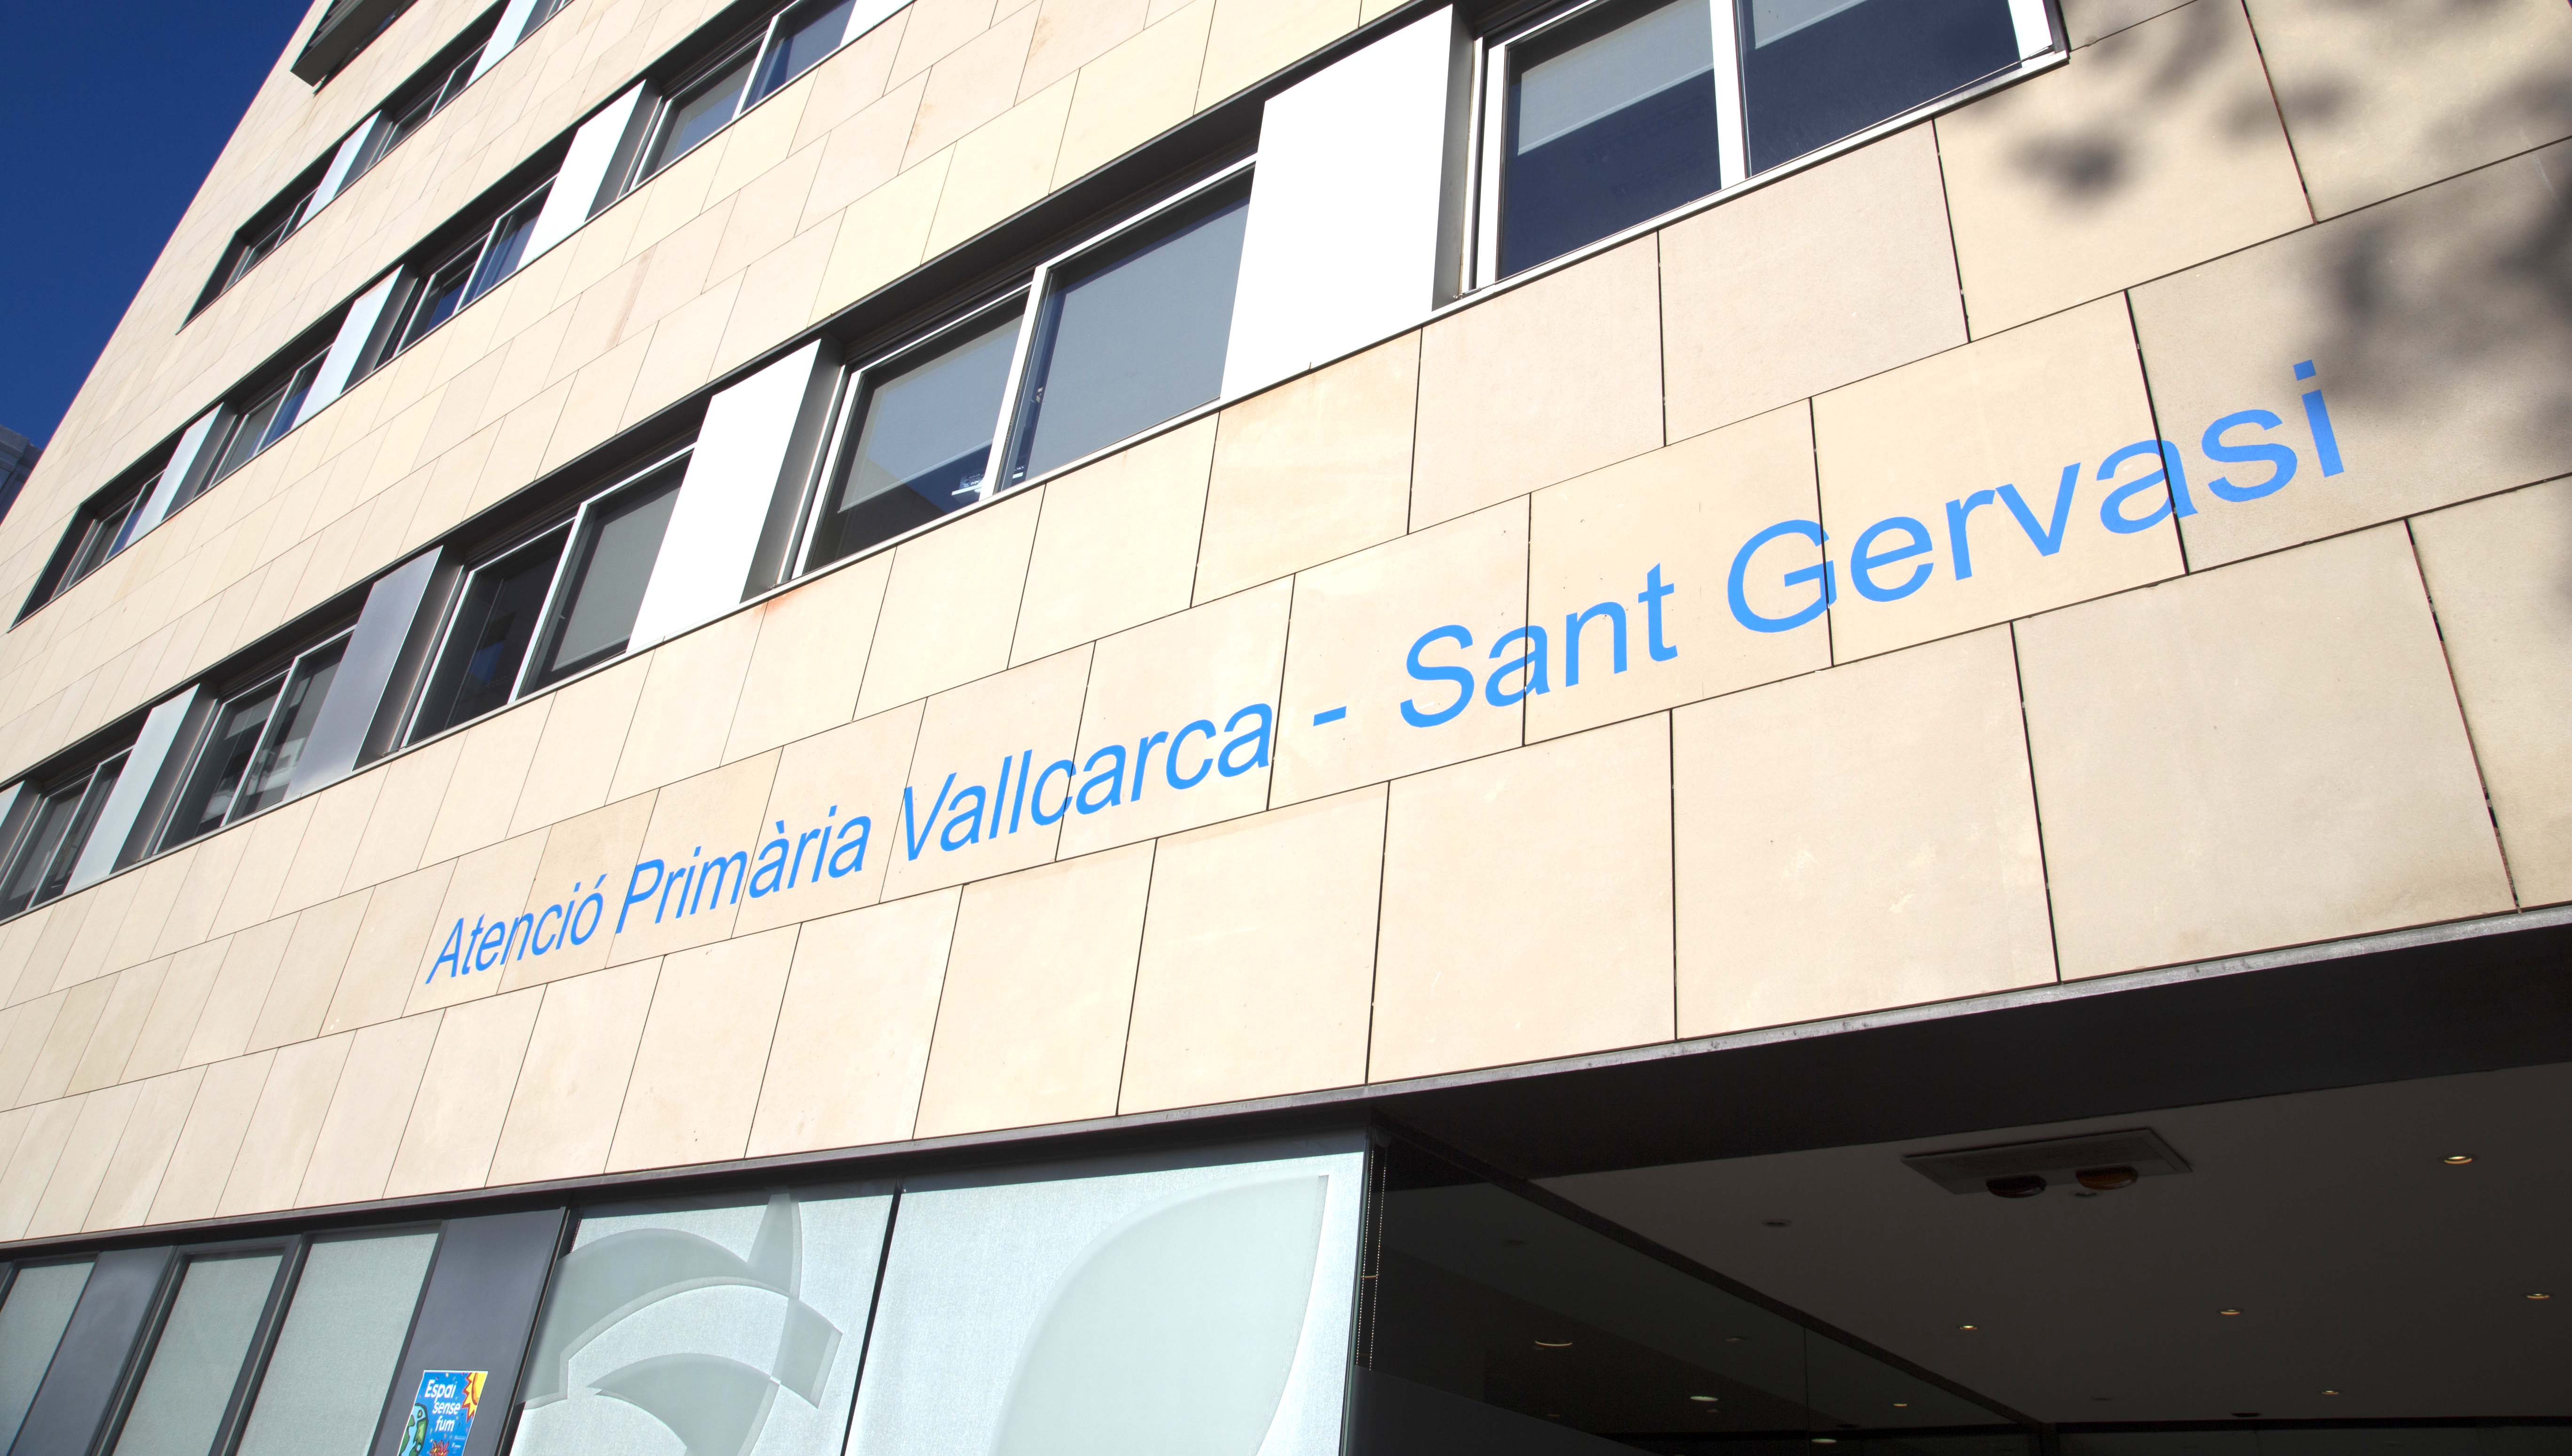 Atenció Primària Vallcarca - Sant Gervasi